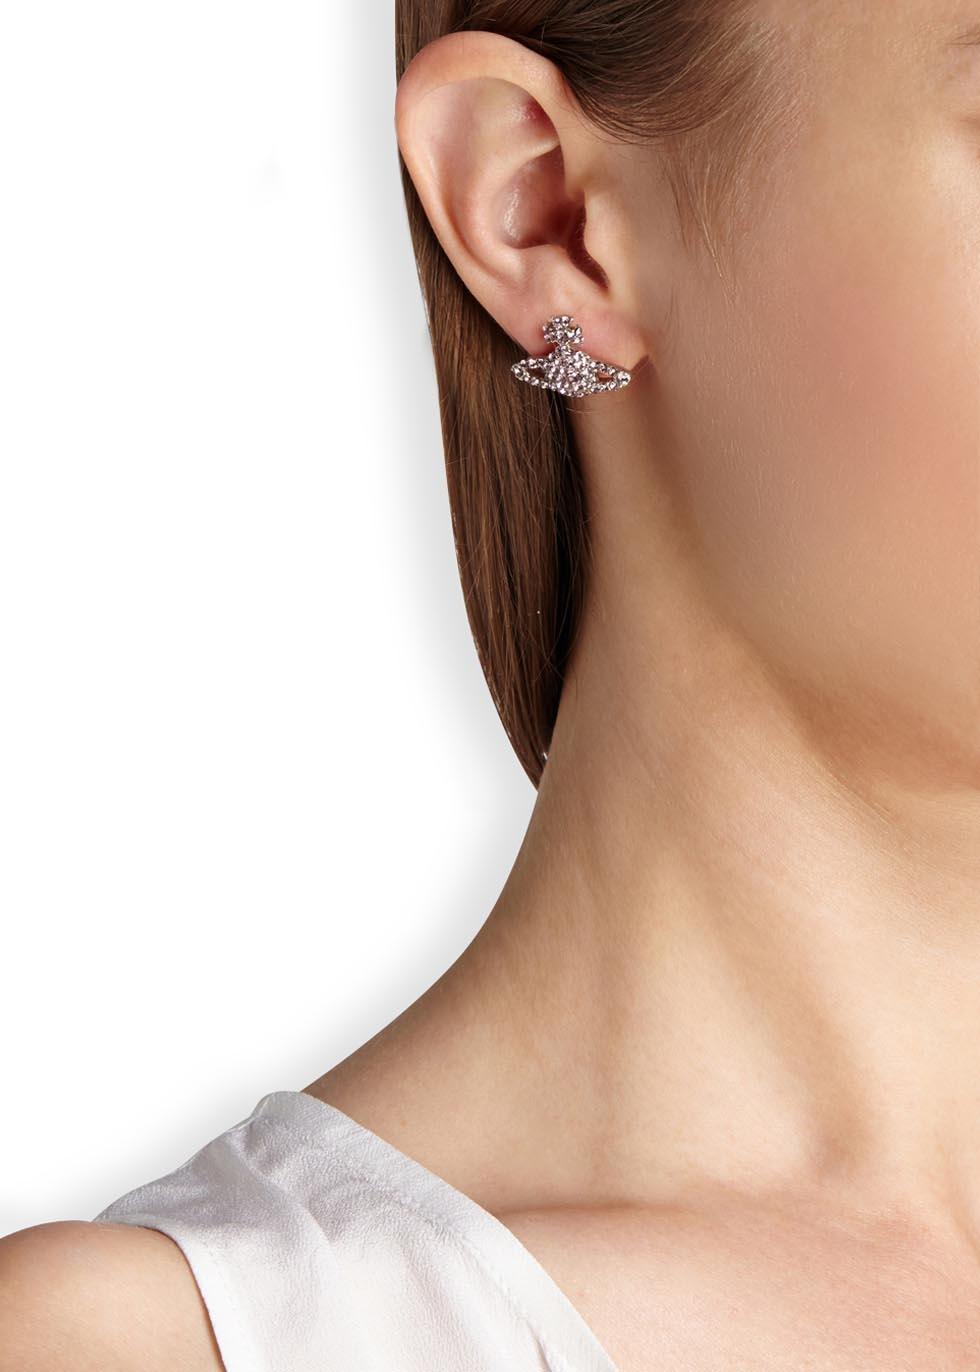 d7b23e5af Vivienne Westwood Grace Bas Relief Silver Tone Orb Earrings in ...